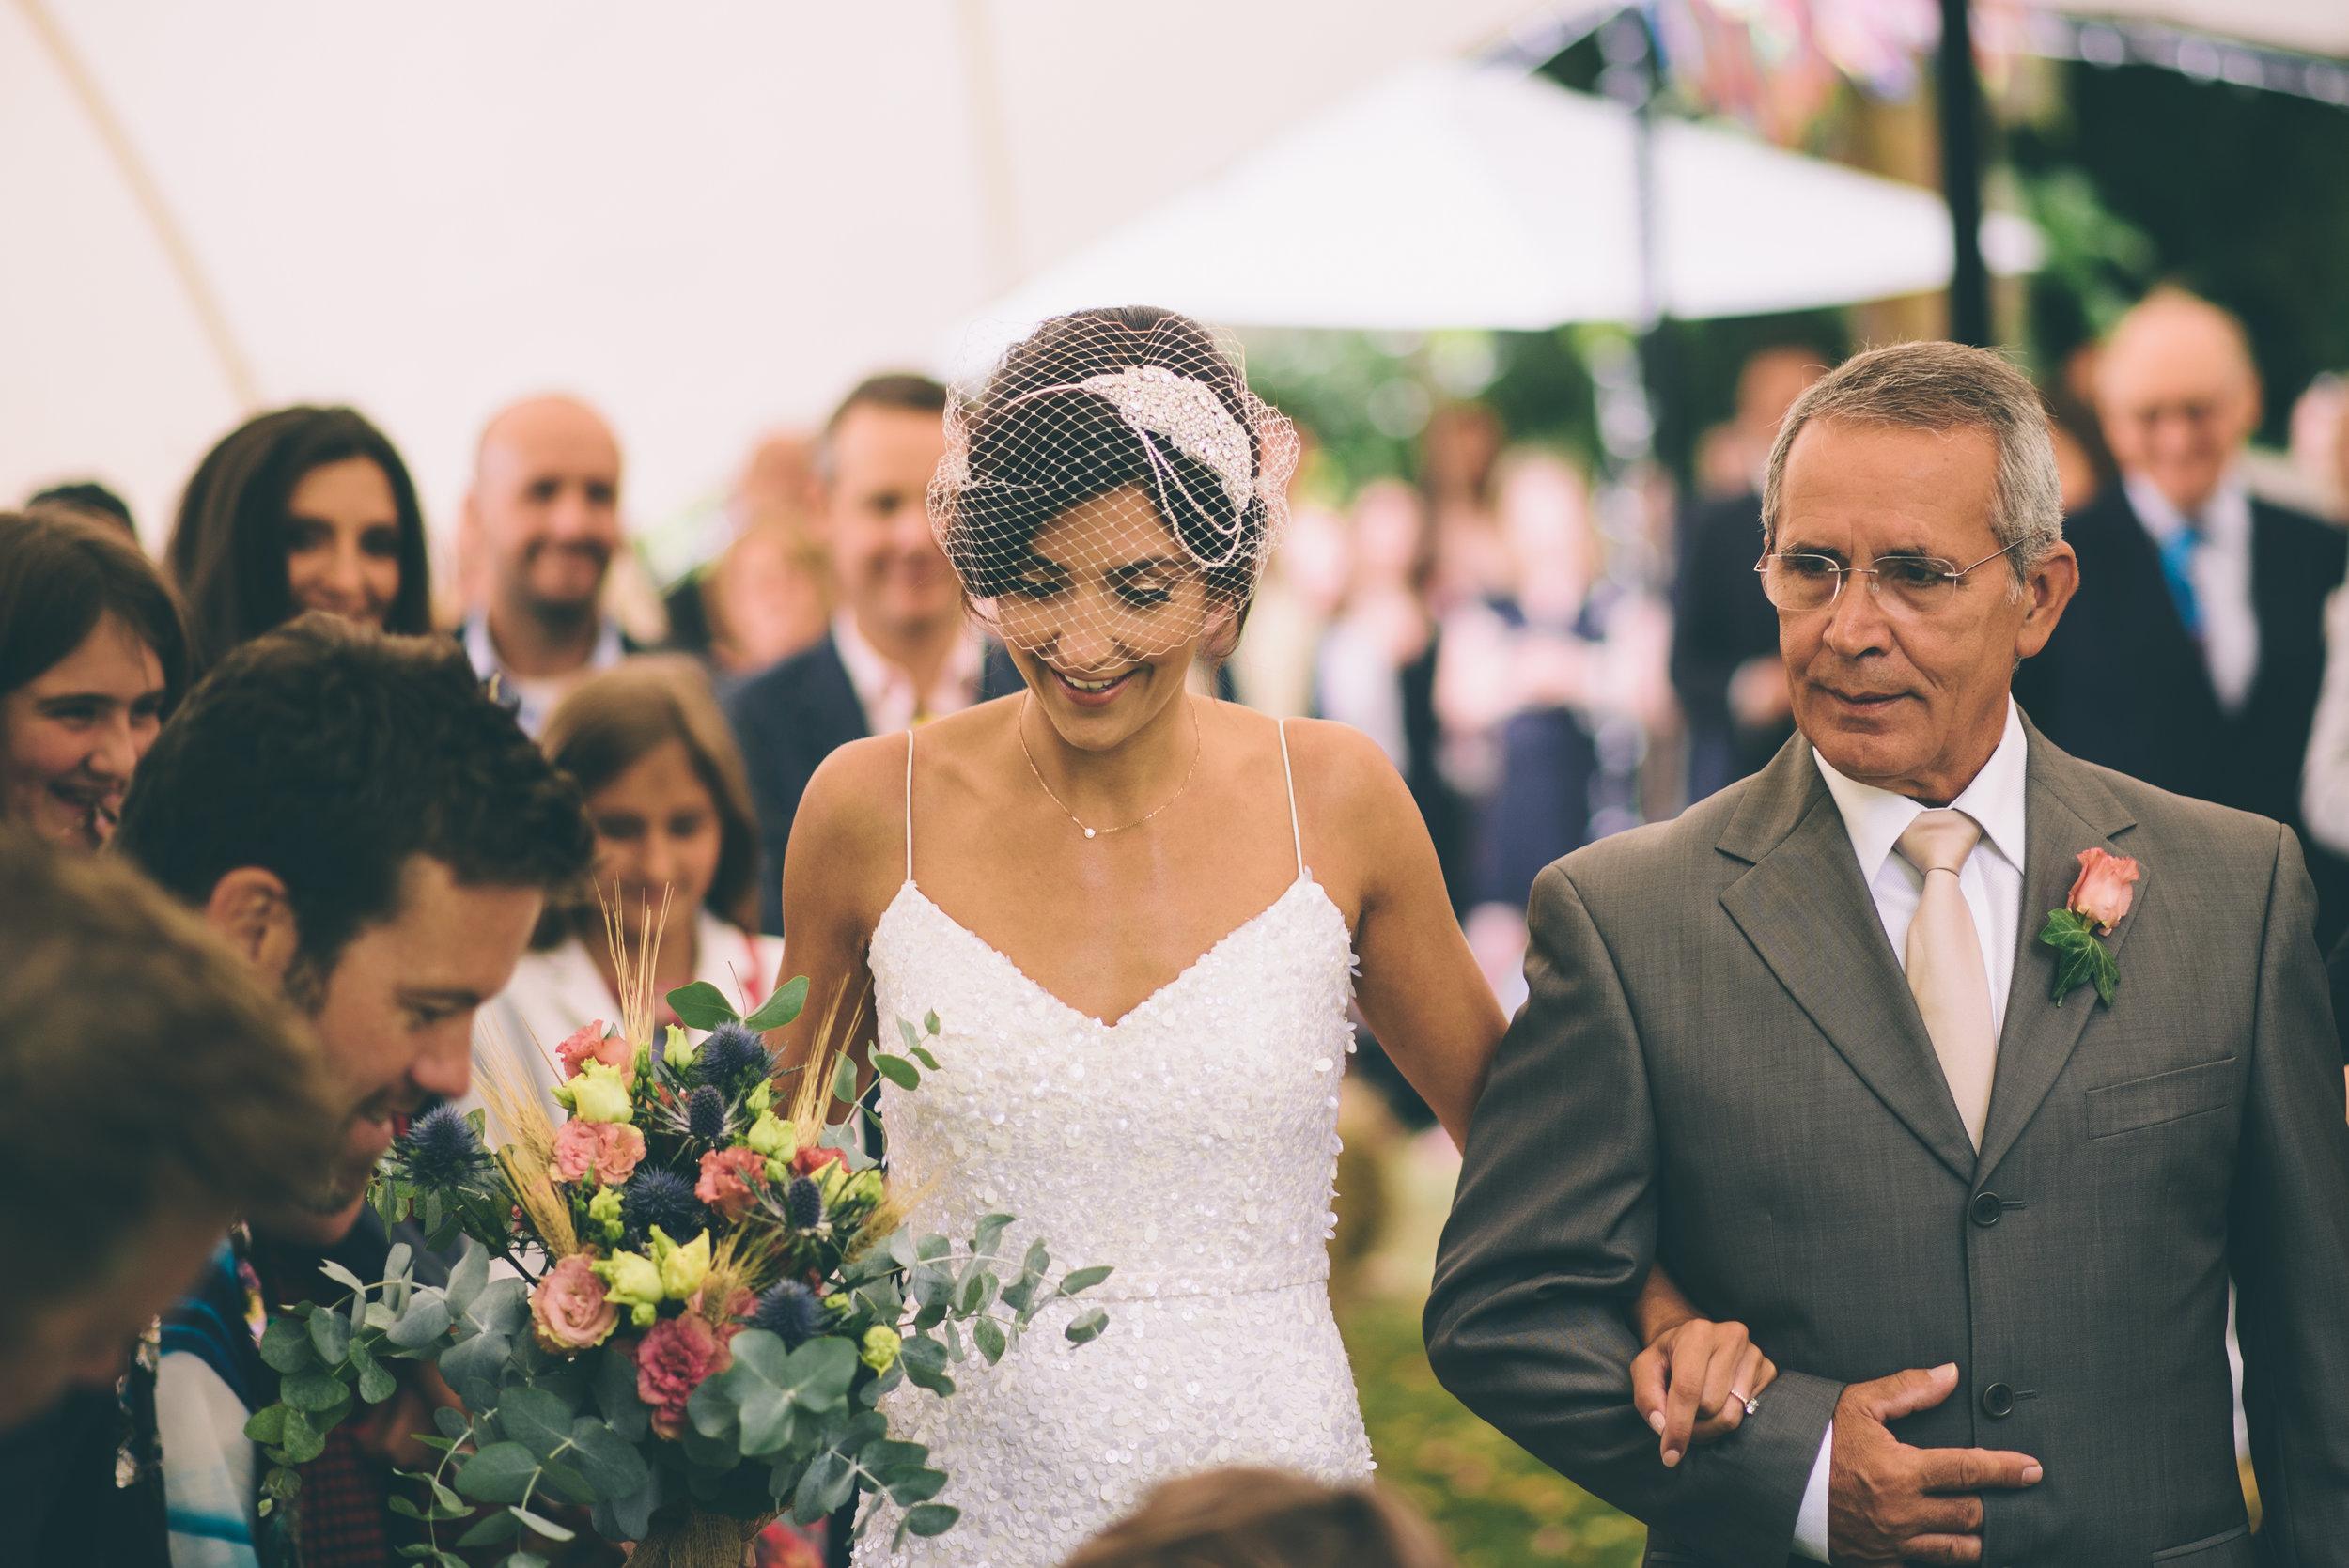 Garden Wedding photography Barley Herefordshire - Tracy + Matt -145.jpg